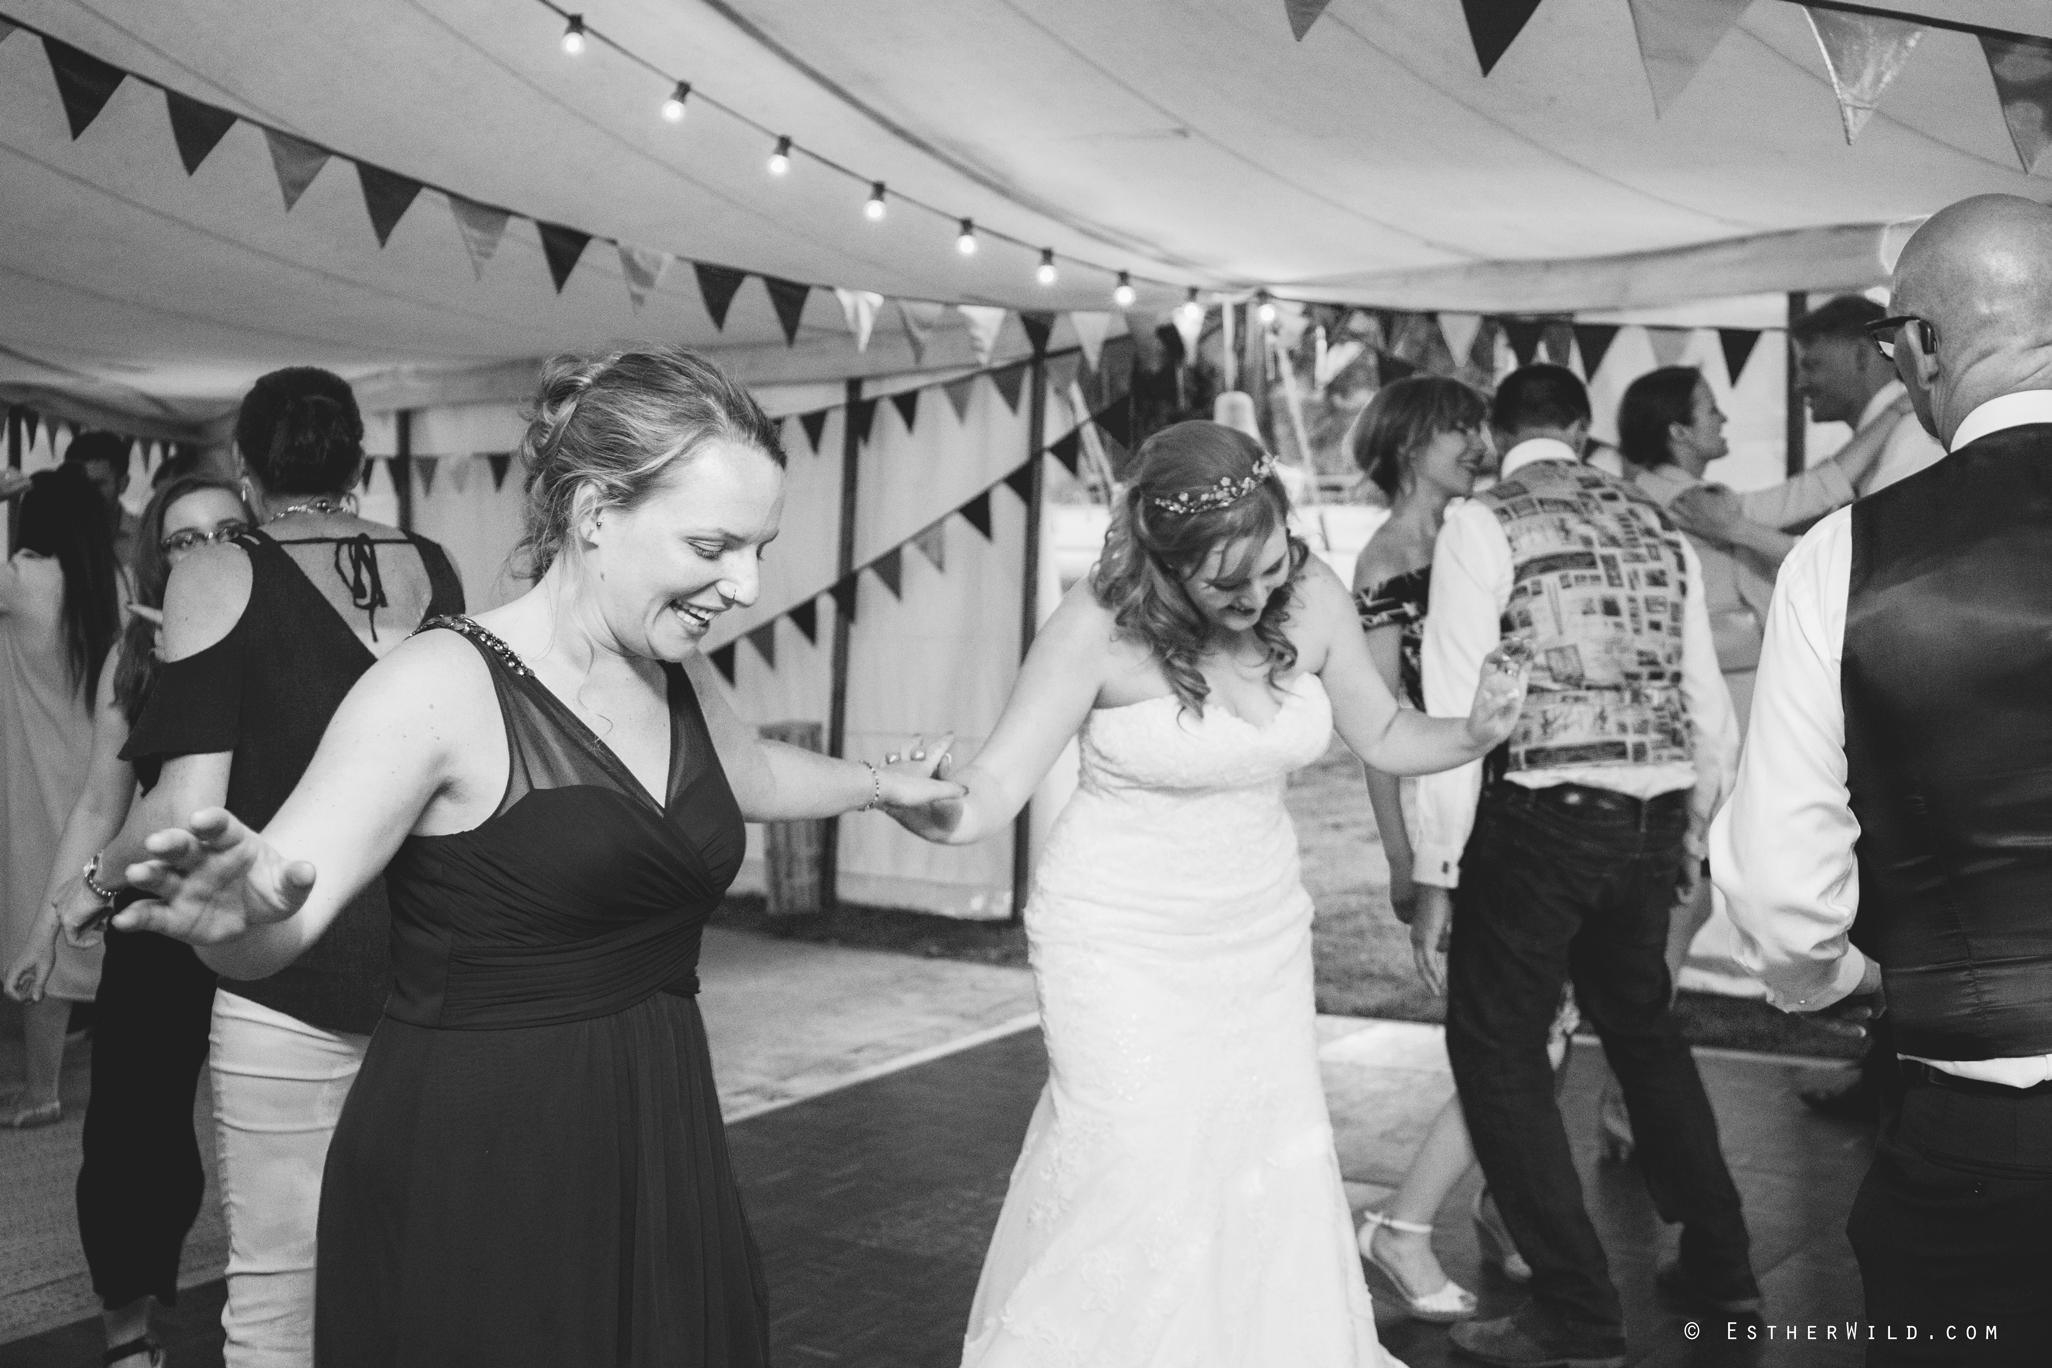 Norfolk_Wedding_Photographer_Mannington_Hall_Country_Esther_Wild_2746-1.jpg